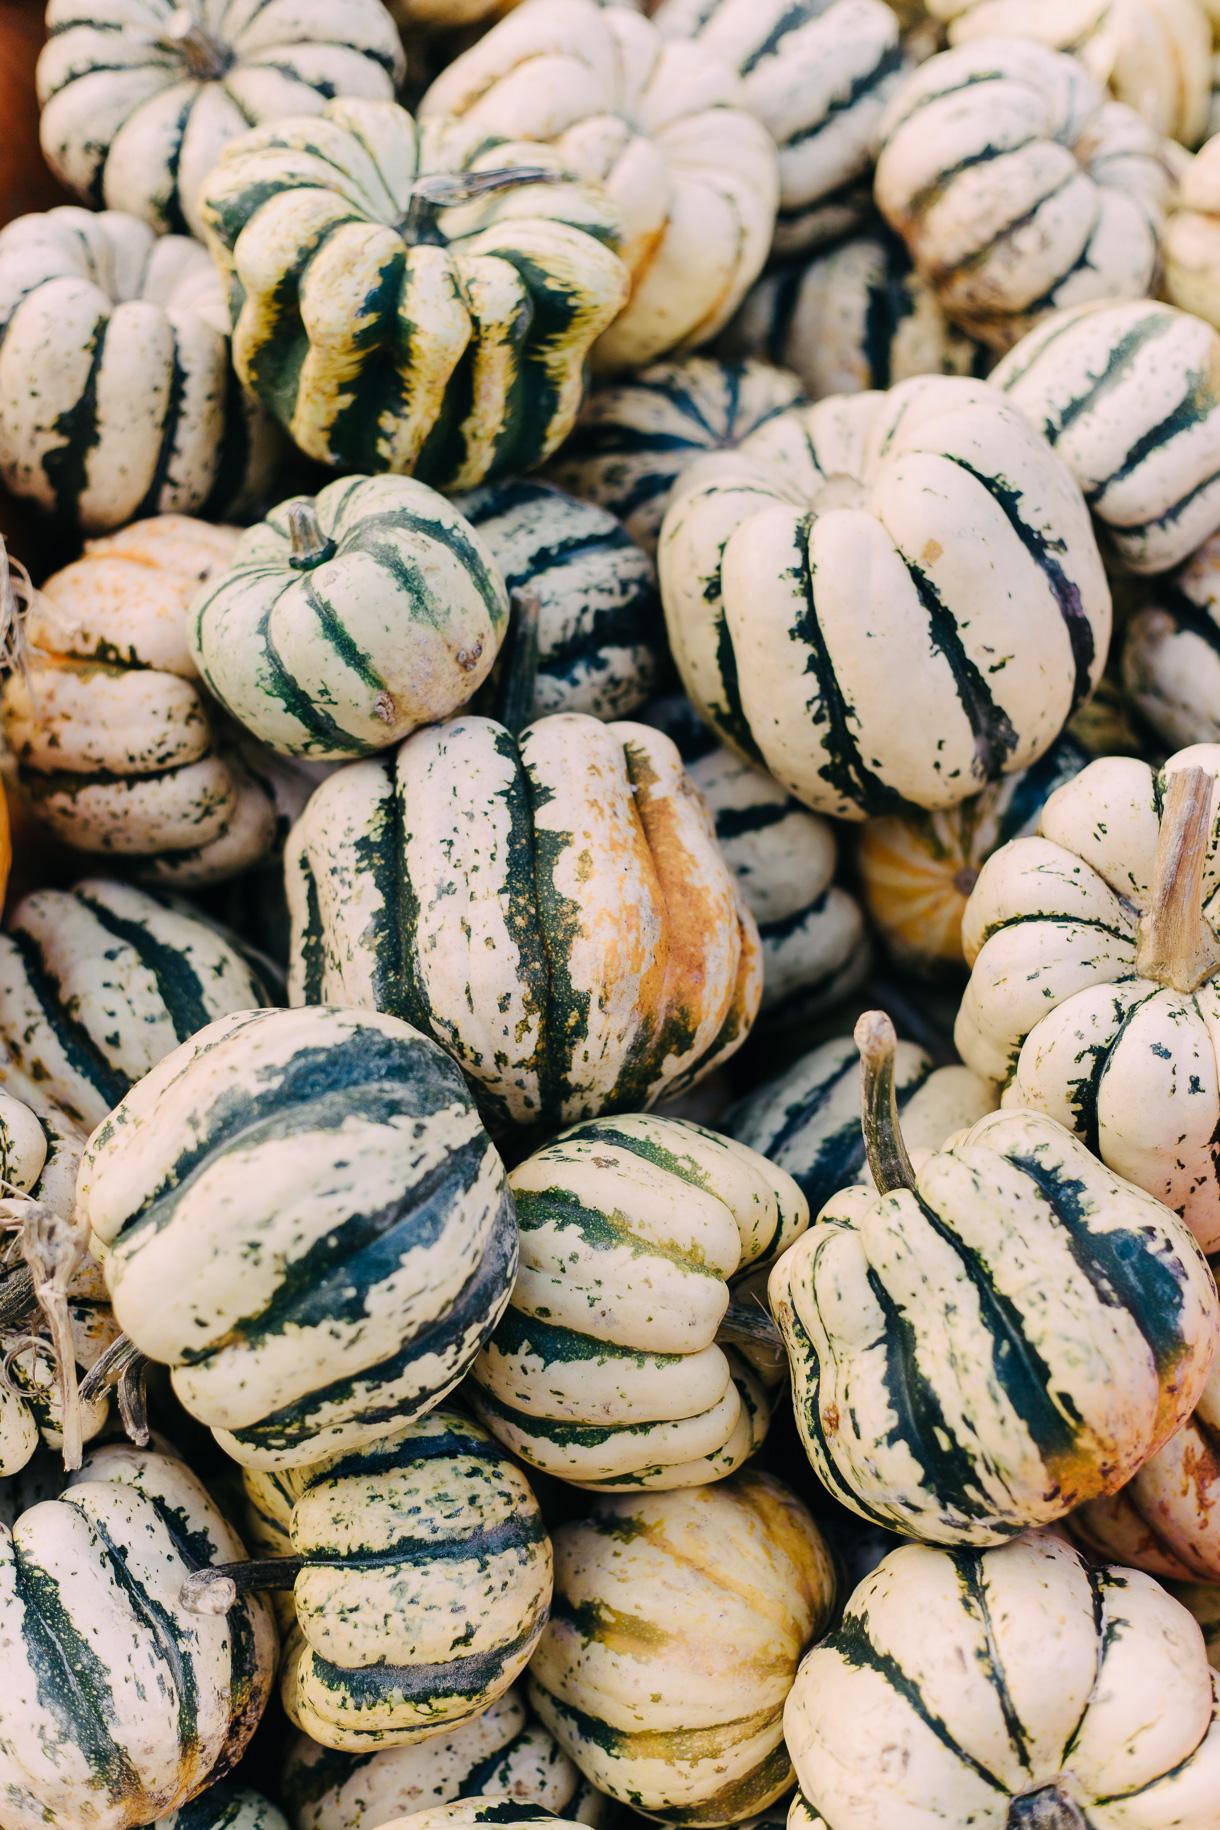 fall-at-union-square-farmers-market-3067